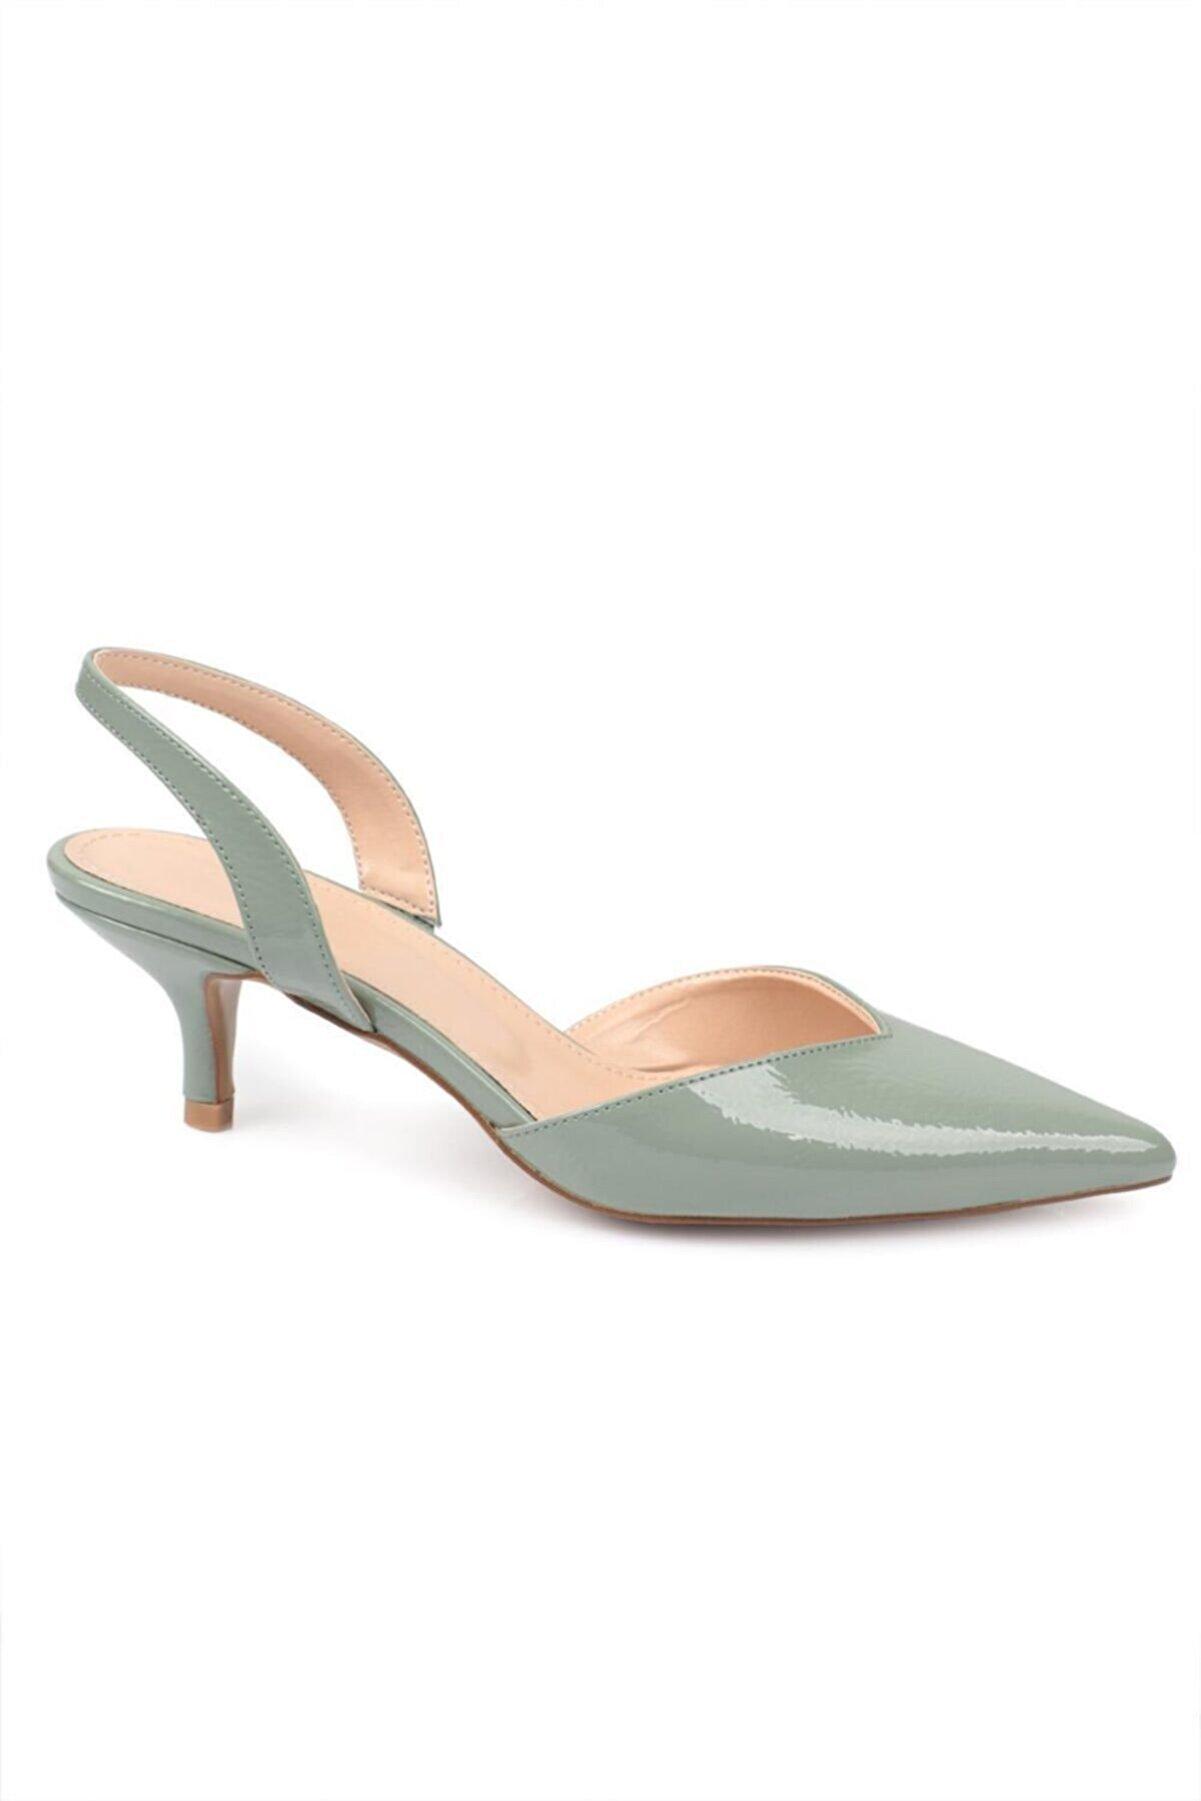 Capone Outfitters 5 Kadın Topuklu Ayakkabı